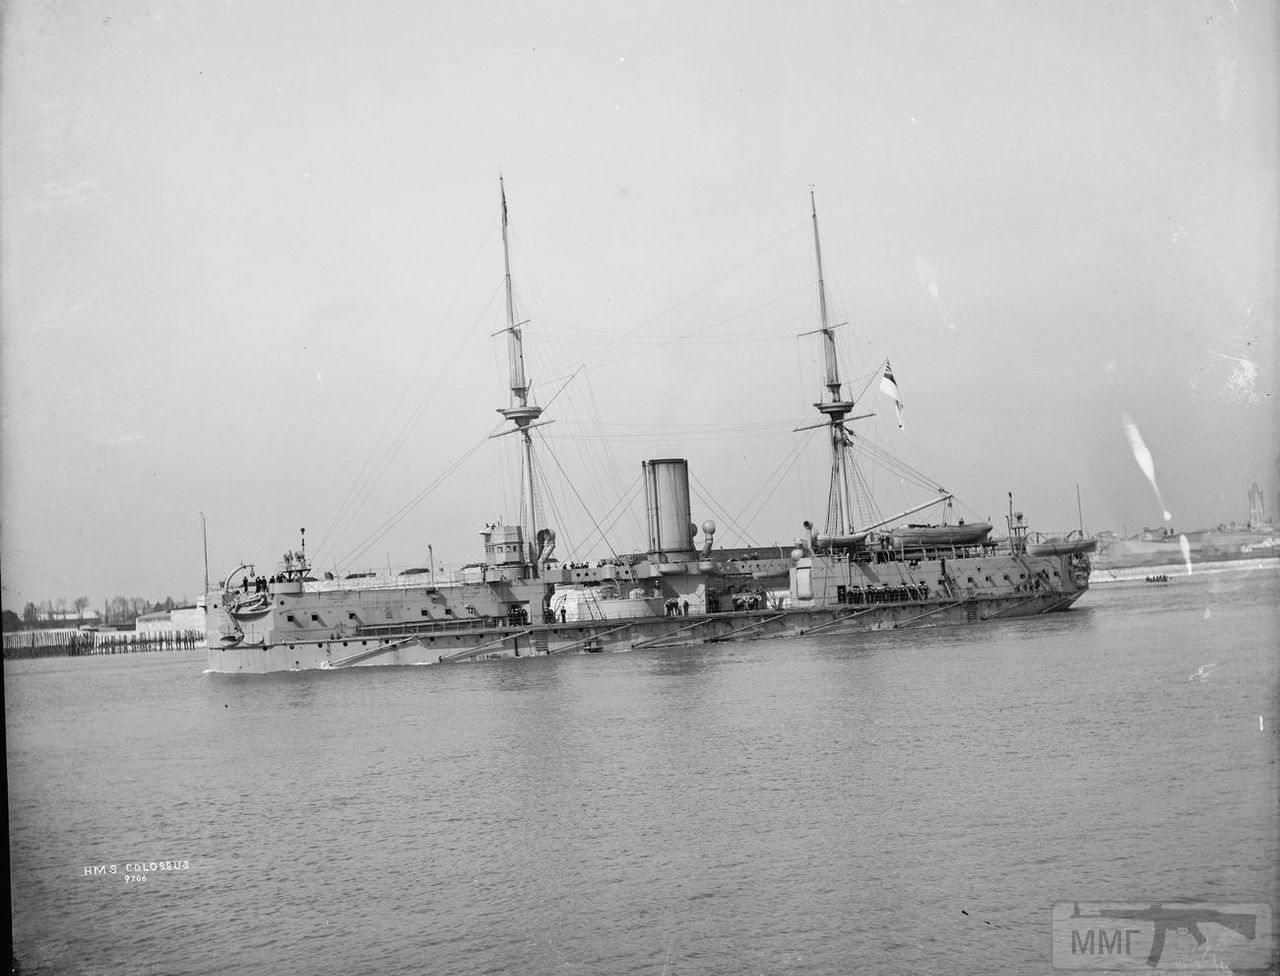 74751 - HMS Colossus